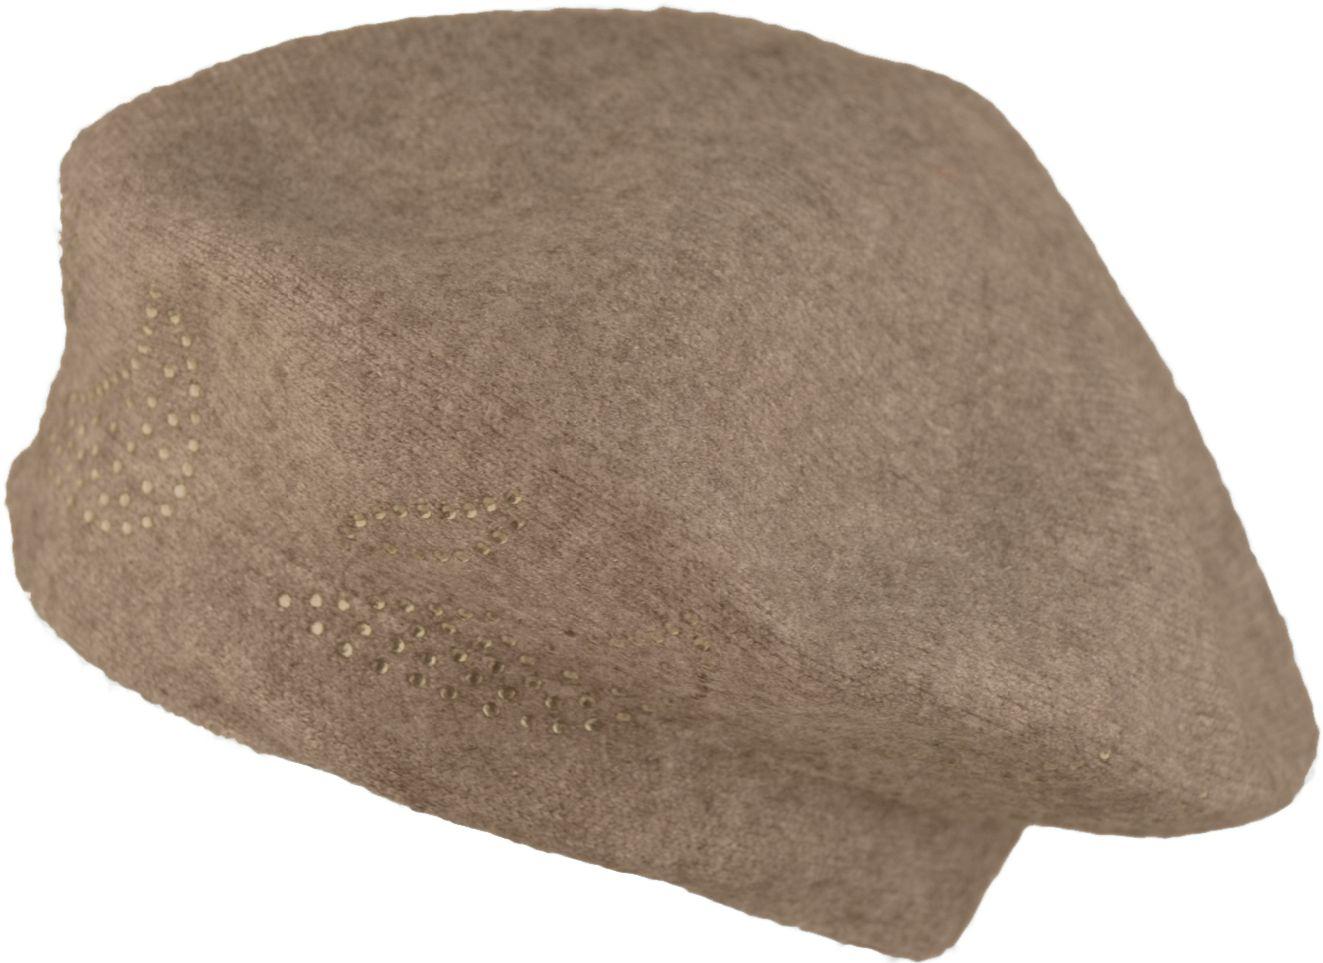 eae2556br_beret-chapeau-pinup-rockabilly-retro-50-s-deborah-brun